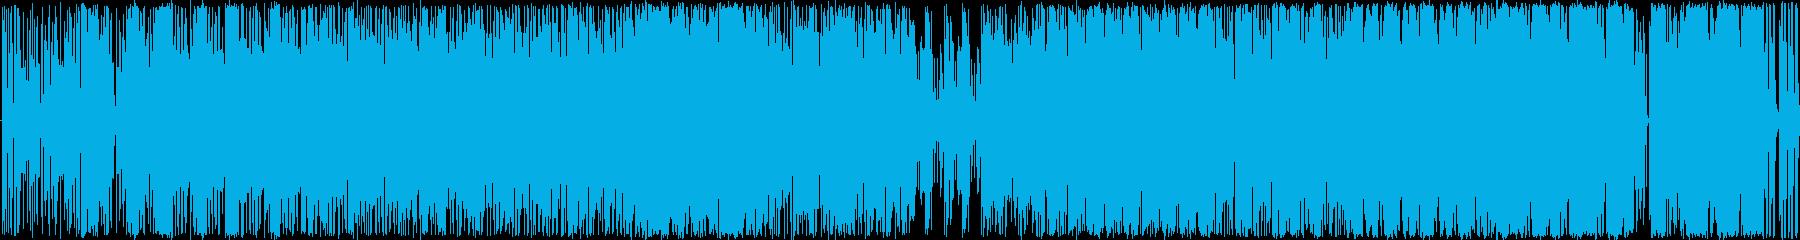 funk風HIPHOPトラックBGMの再生済みの波形